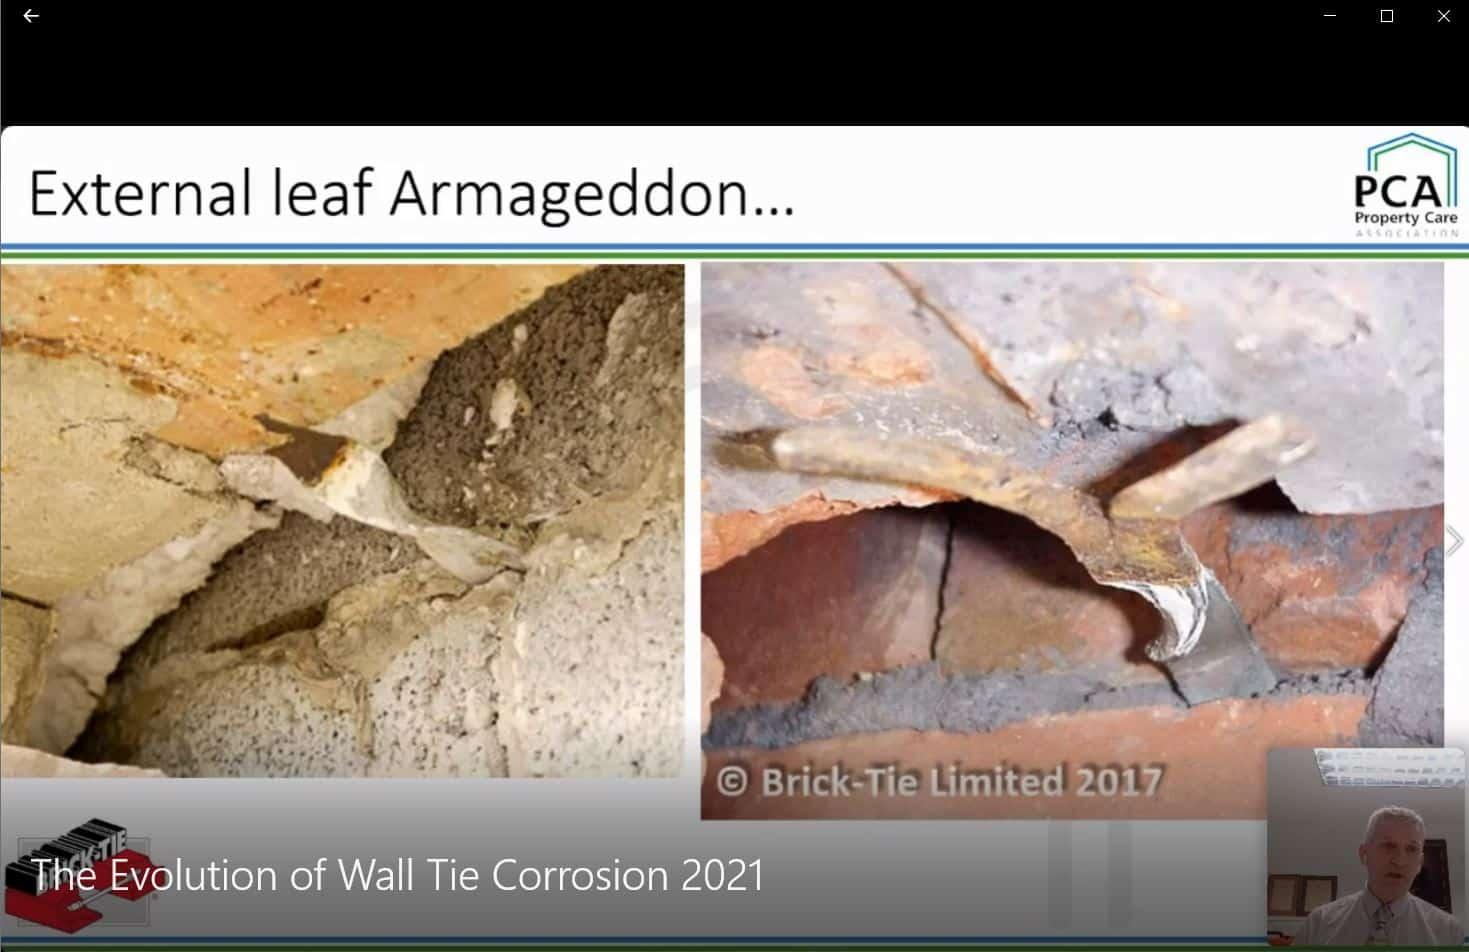 Wall Tie Corrosion webinar